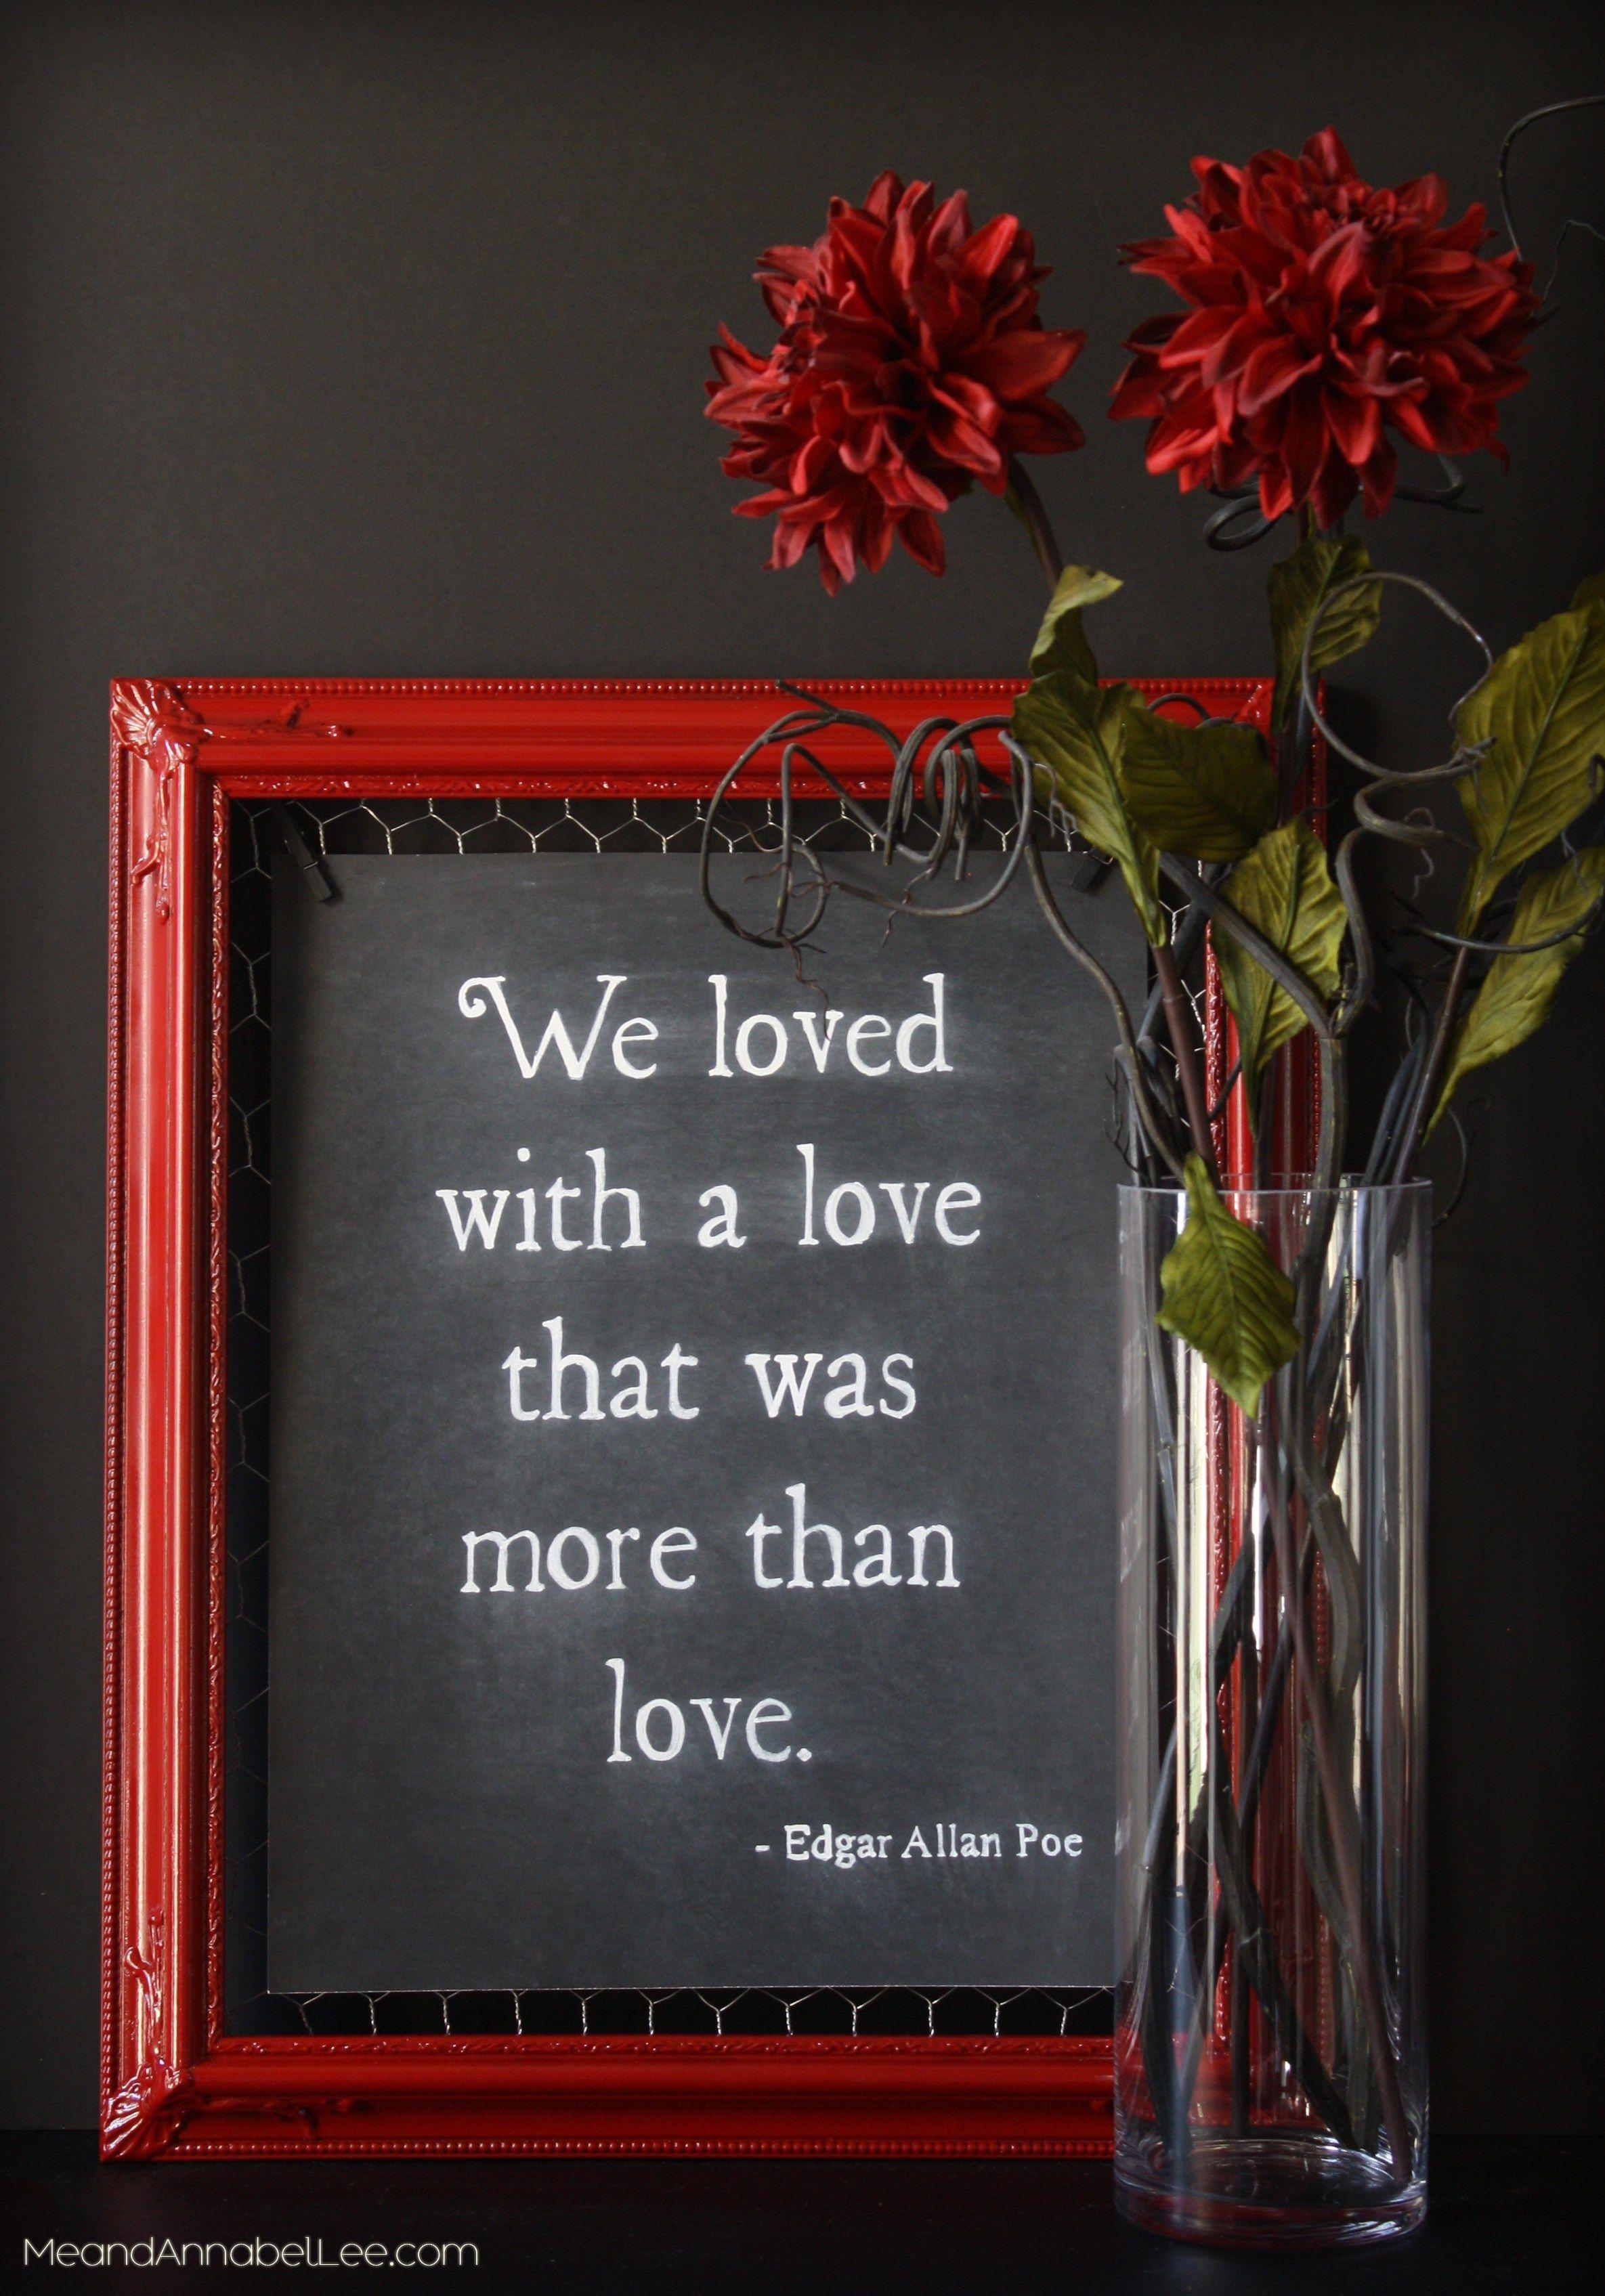 Dark Romance DIY Chalkboard Art - Annabel Lee Quote by Edgar Allan ...